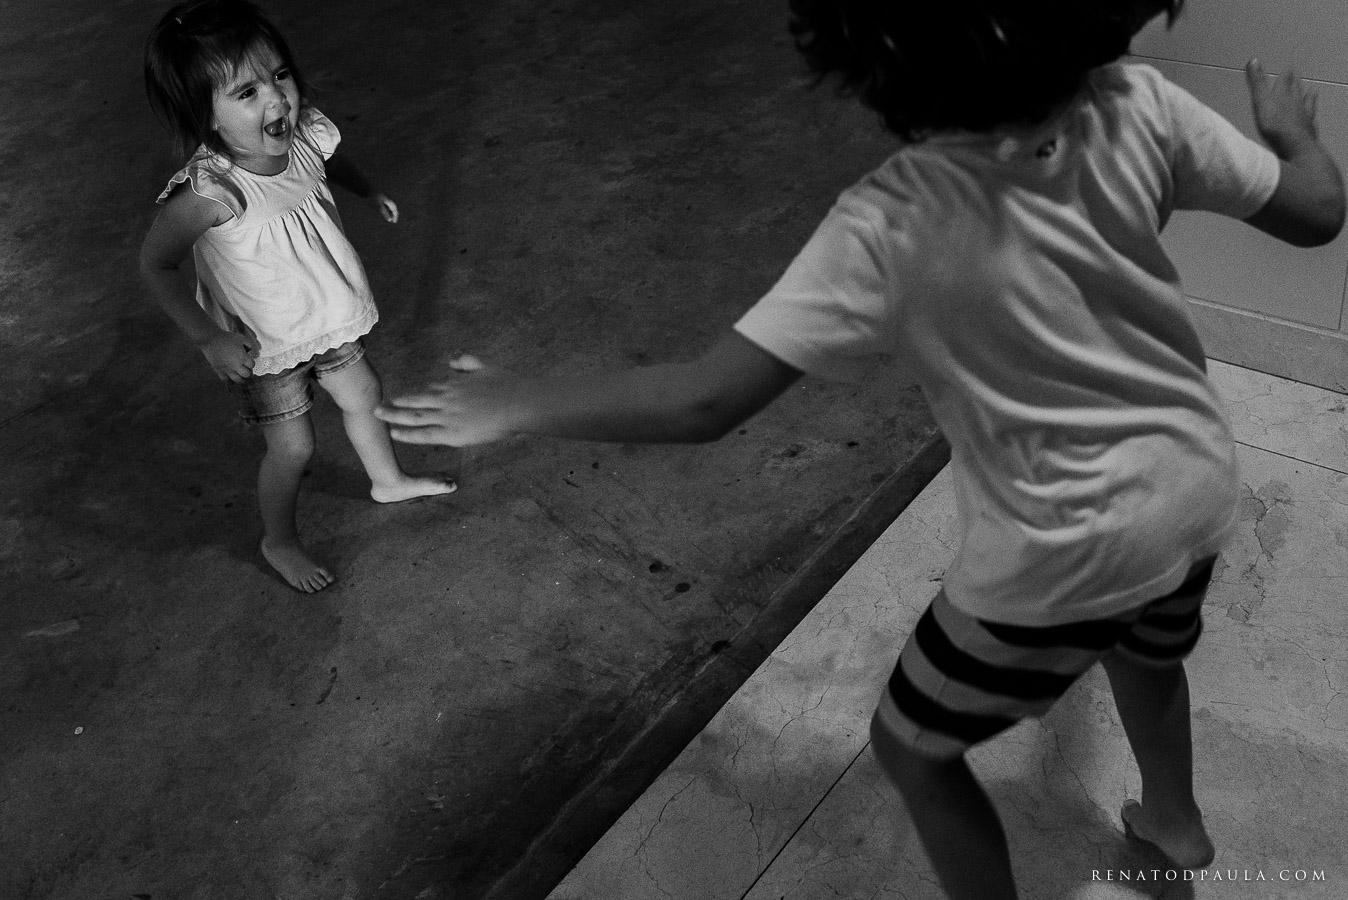 renato-dpaula-fotografia-de-familia-documental-12